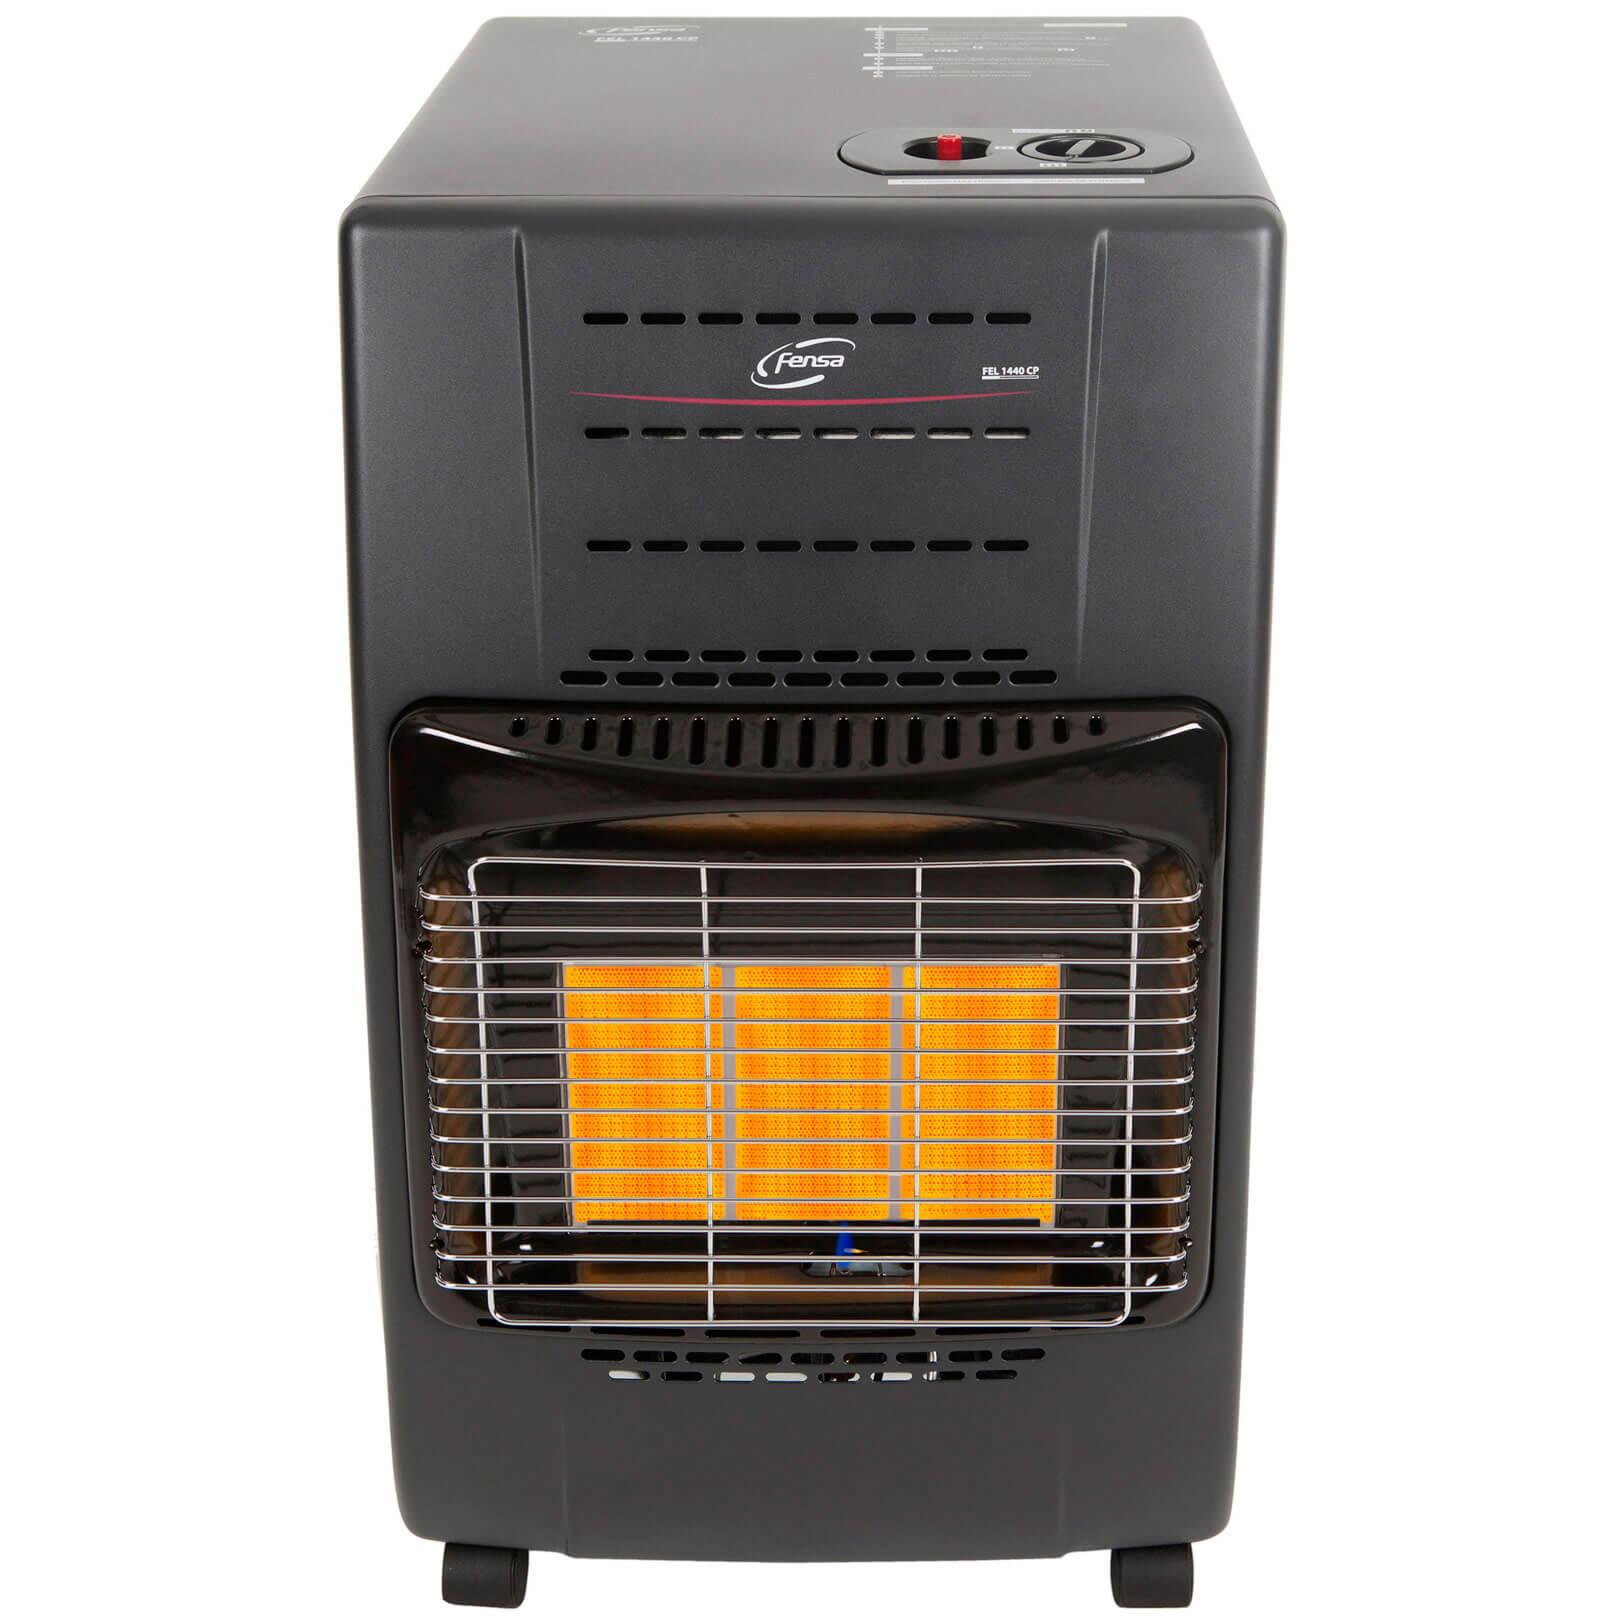 Estufa gas fel 1440 cp calefacci n fensa tecnolog a - Estufa gas radiante ...